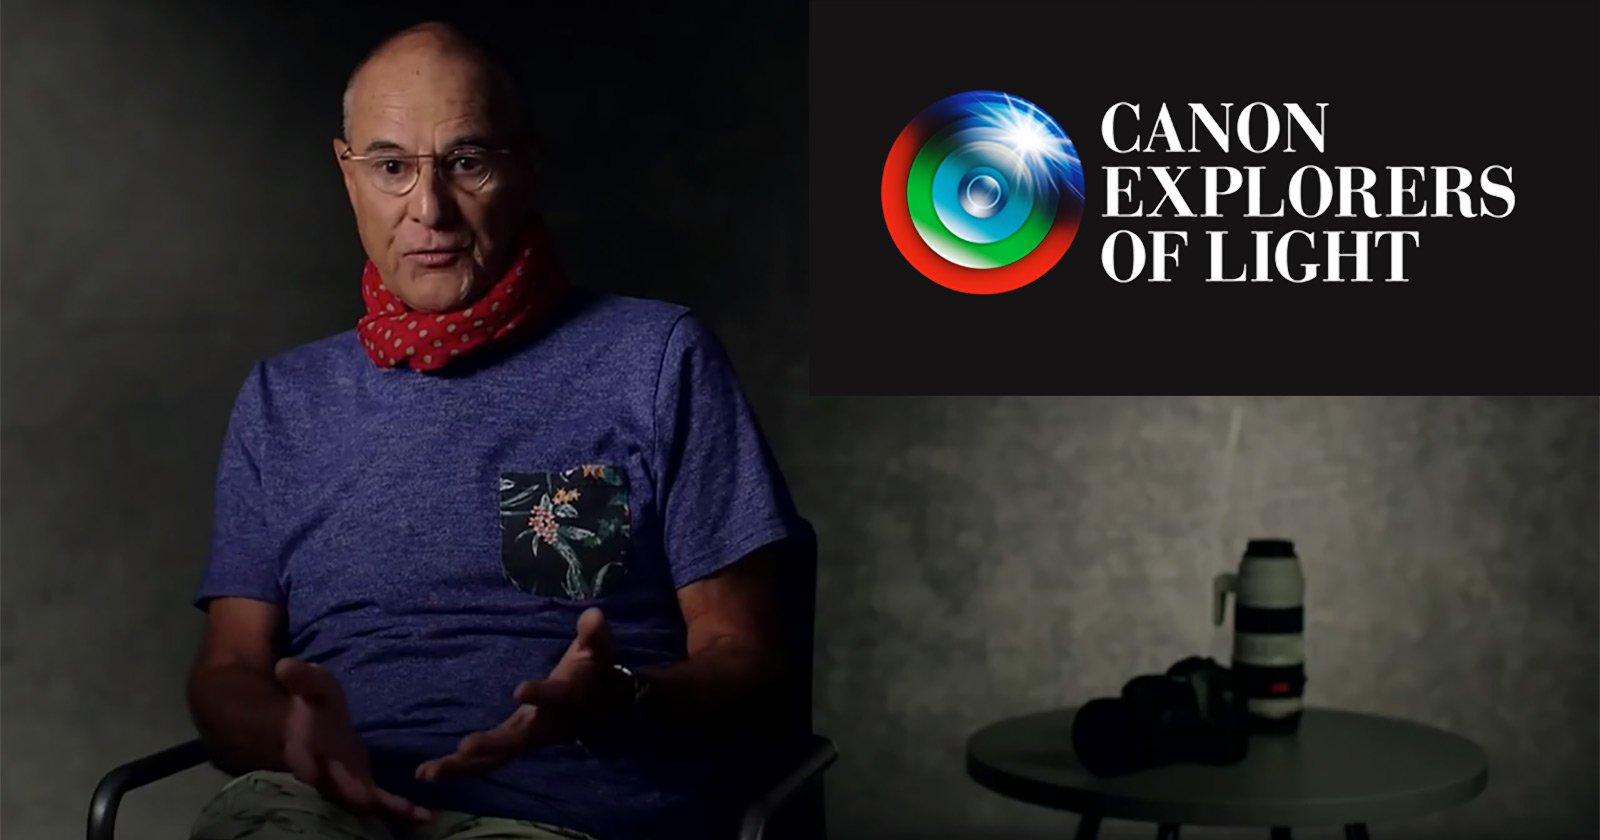 5 Inspiring Videos Featuring Canon's 'Explorers of Light' Photographers